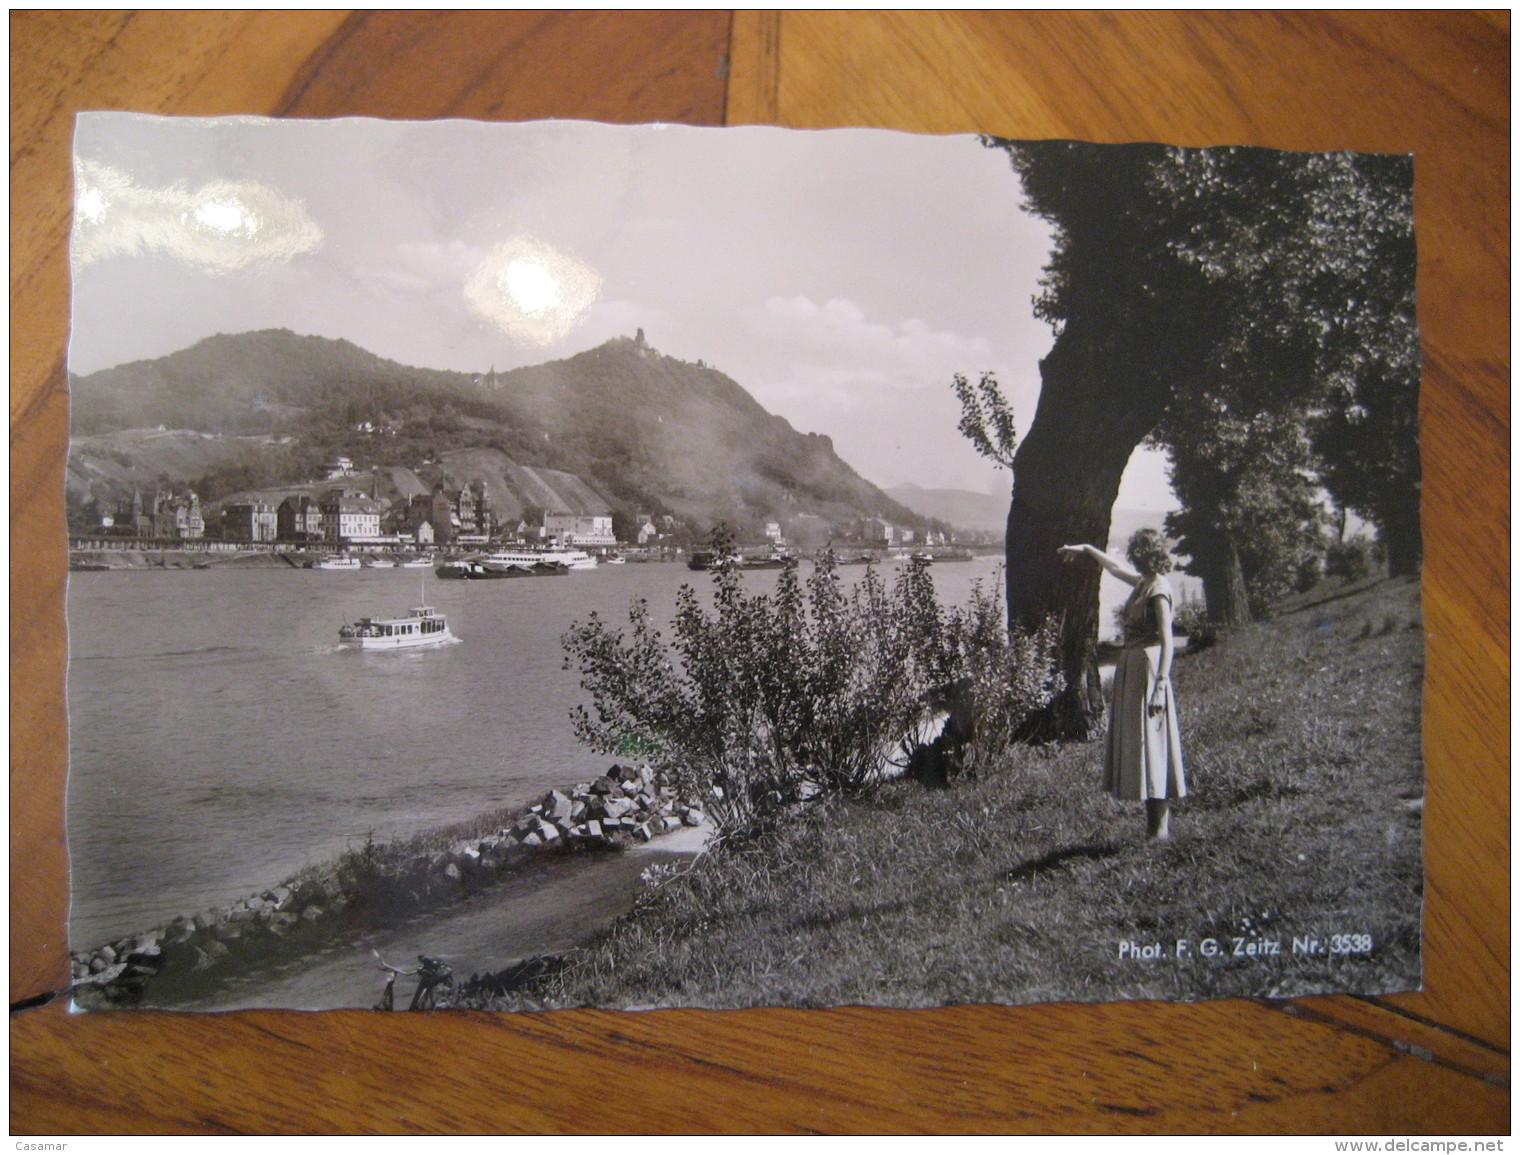 KONIGSWINTER Drachenfels Boat Ship River Post Card North Rhine Westphalia Koln Rhein Sieg Kries Germany - Koenigswinter